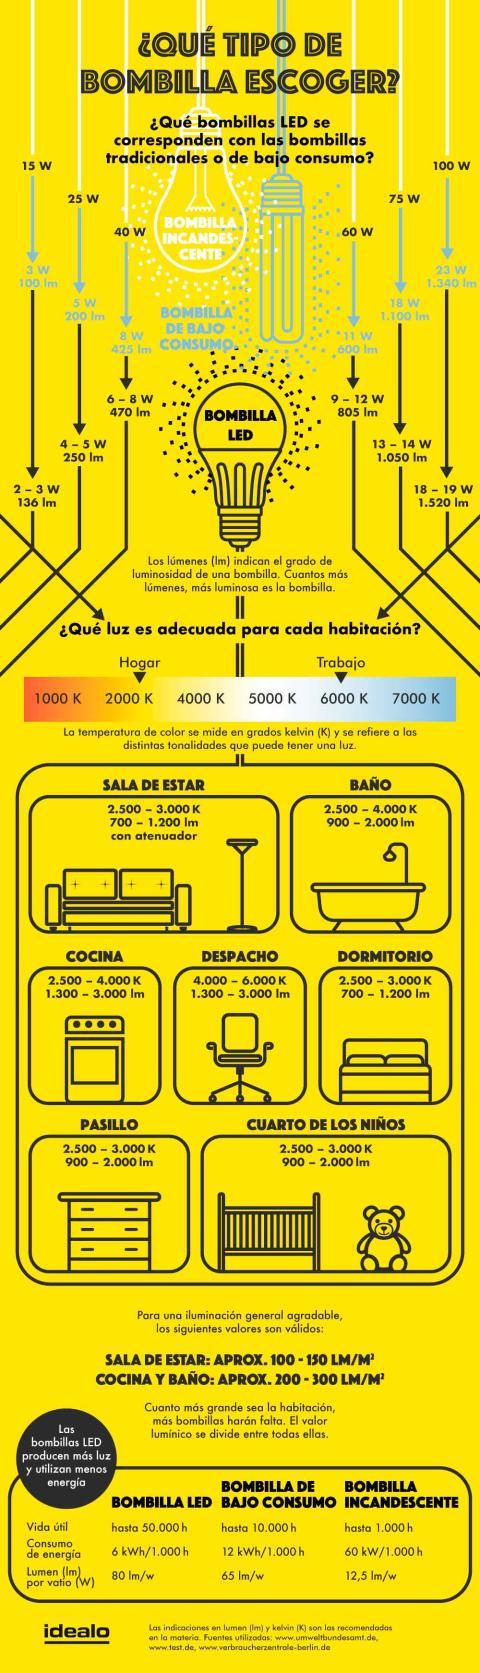 Infografía del ahorro de una bombilla LED